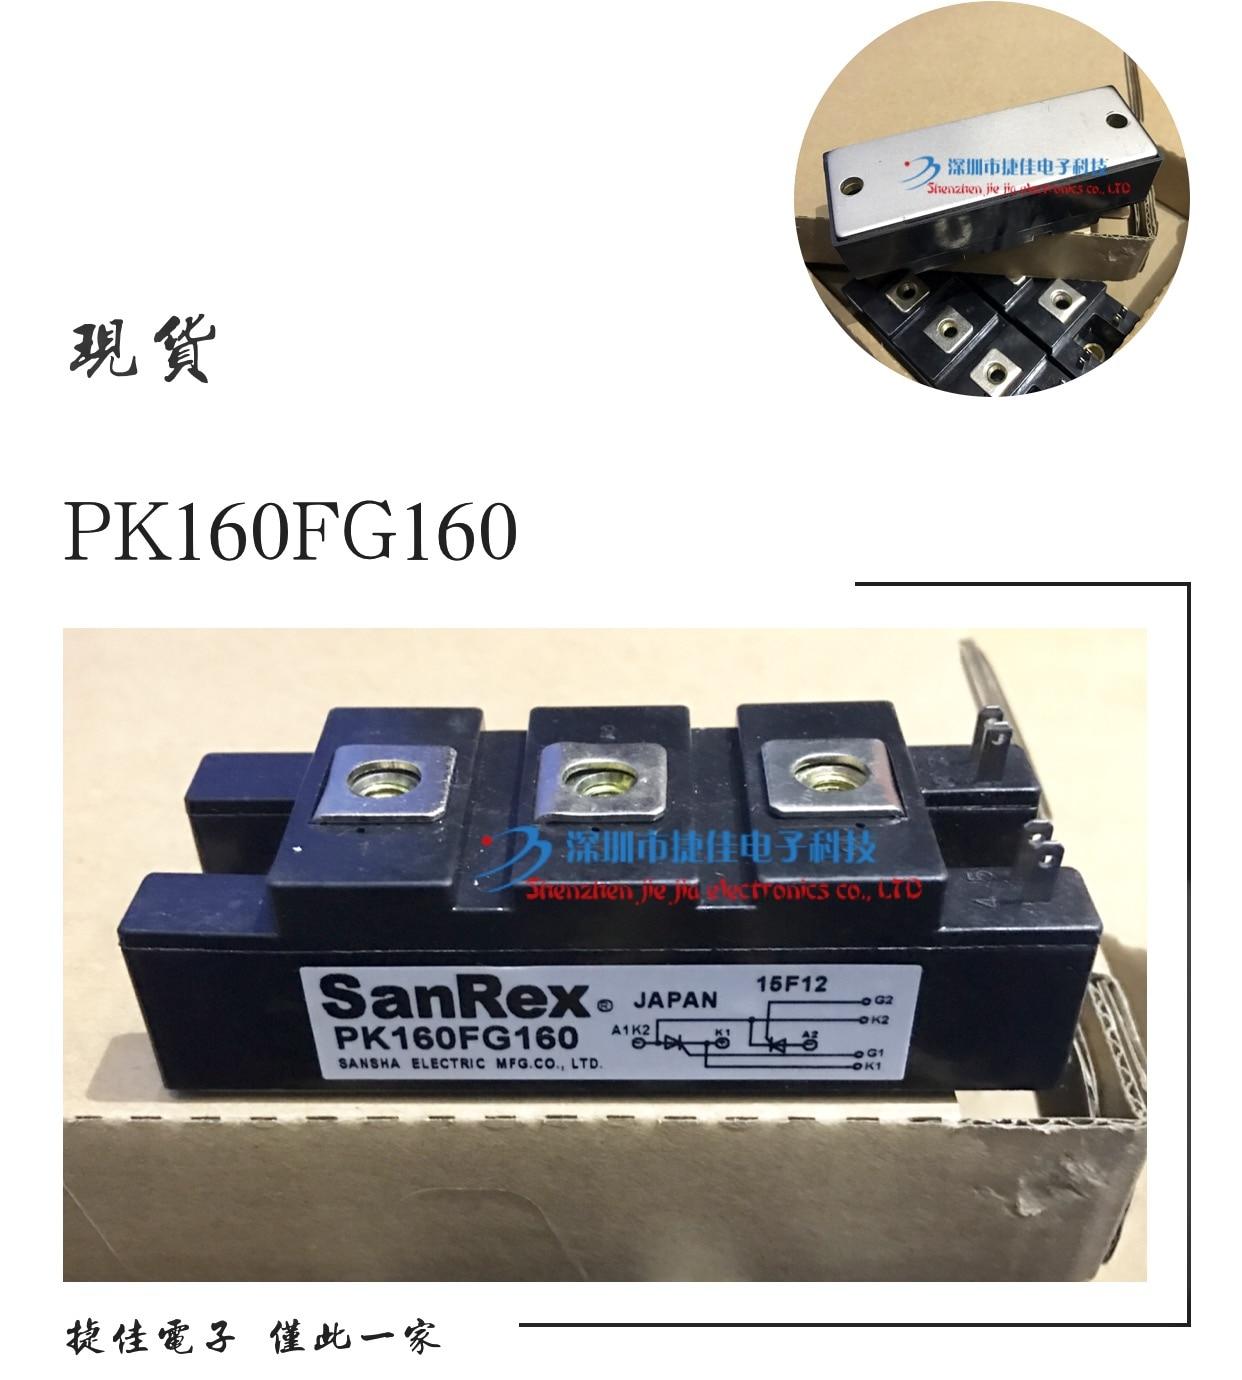 PK160FG160 PK200FG160 PD200FG-160 PK160FG120